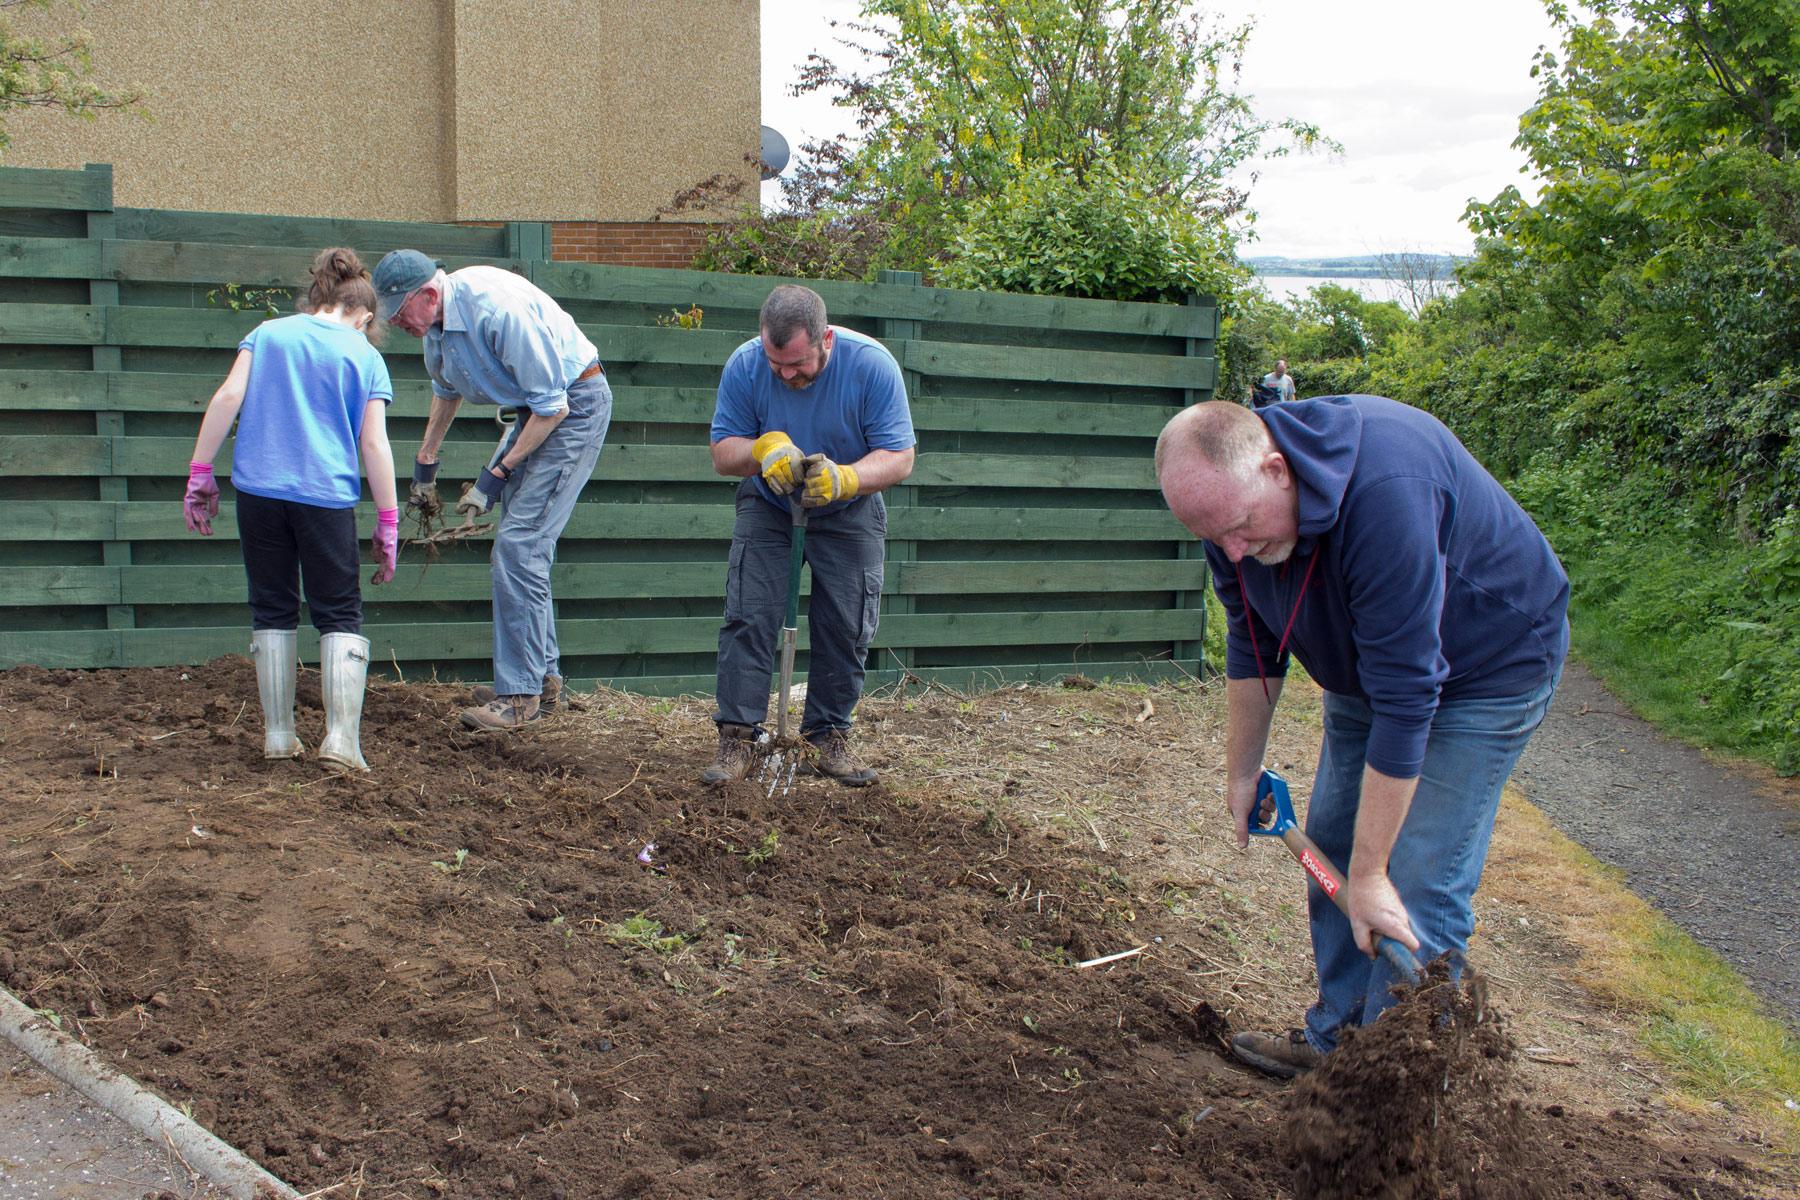 Digging over 11 May